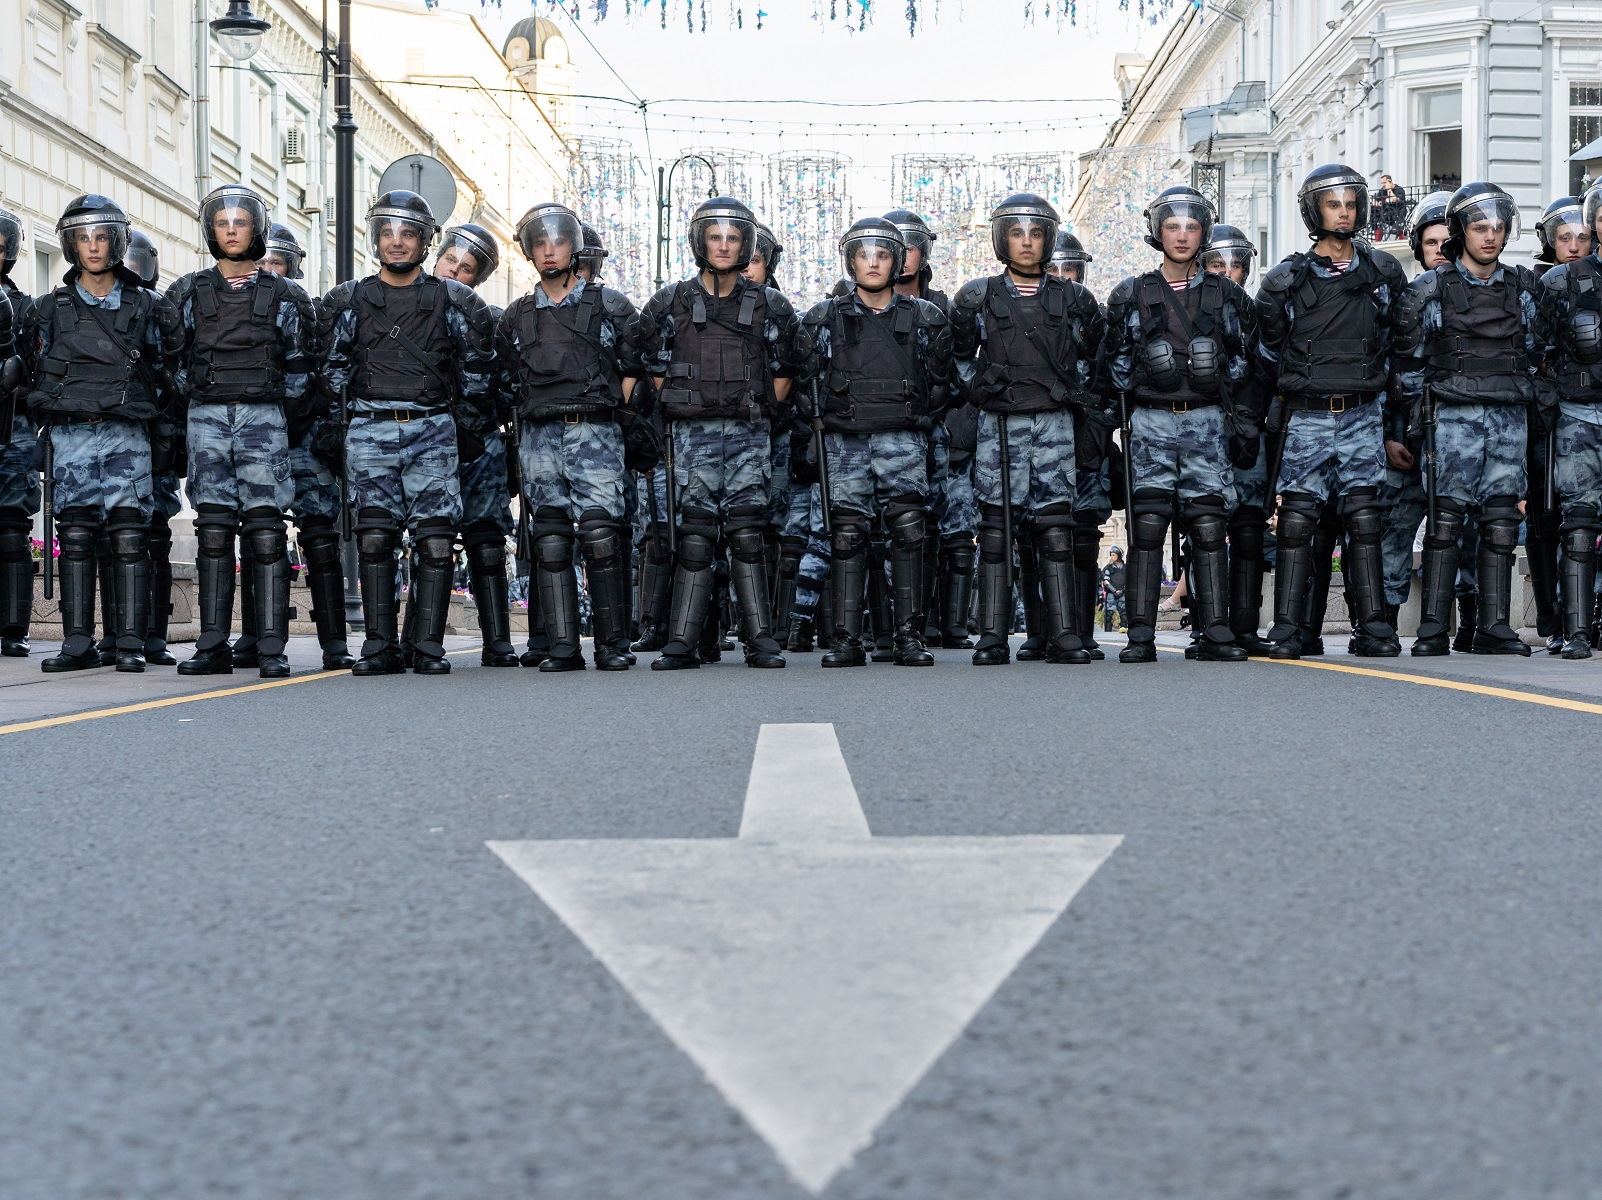 Russia Blocks 2 Crypto News Websites